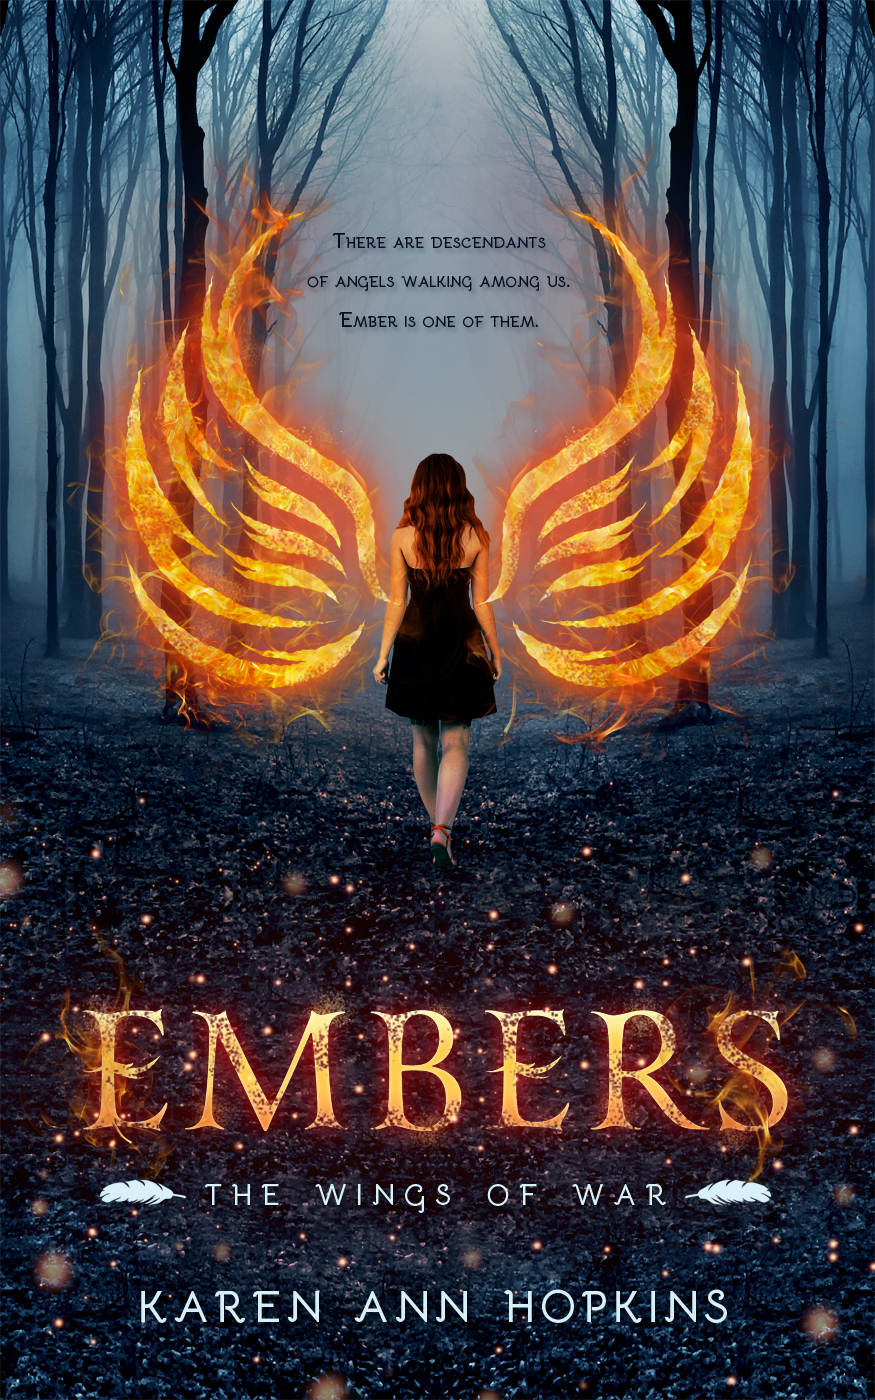 https://www.goodreads.com/book/show/22755233-embers